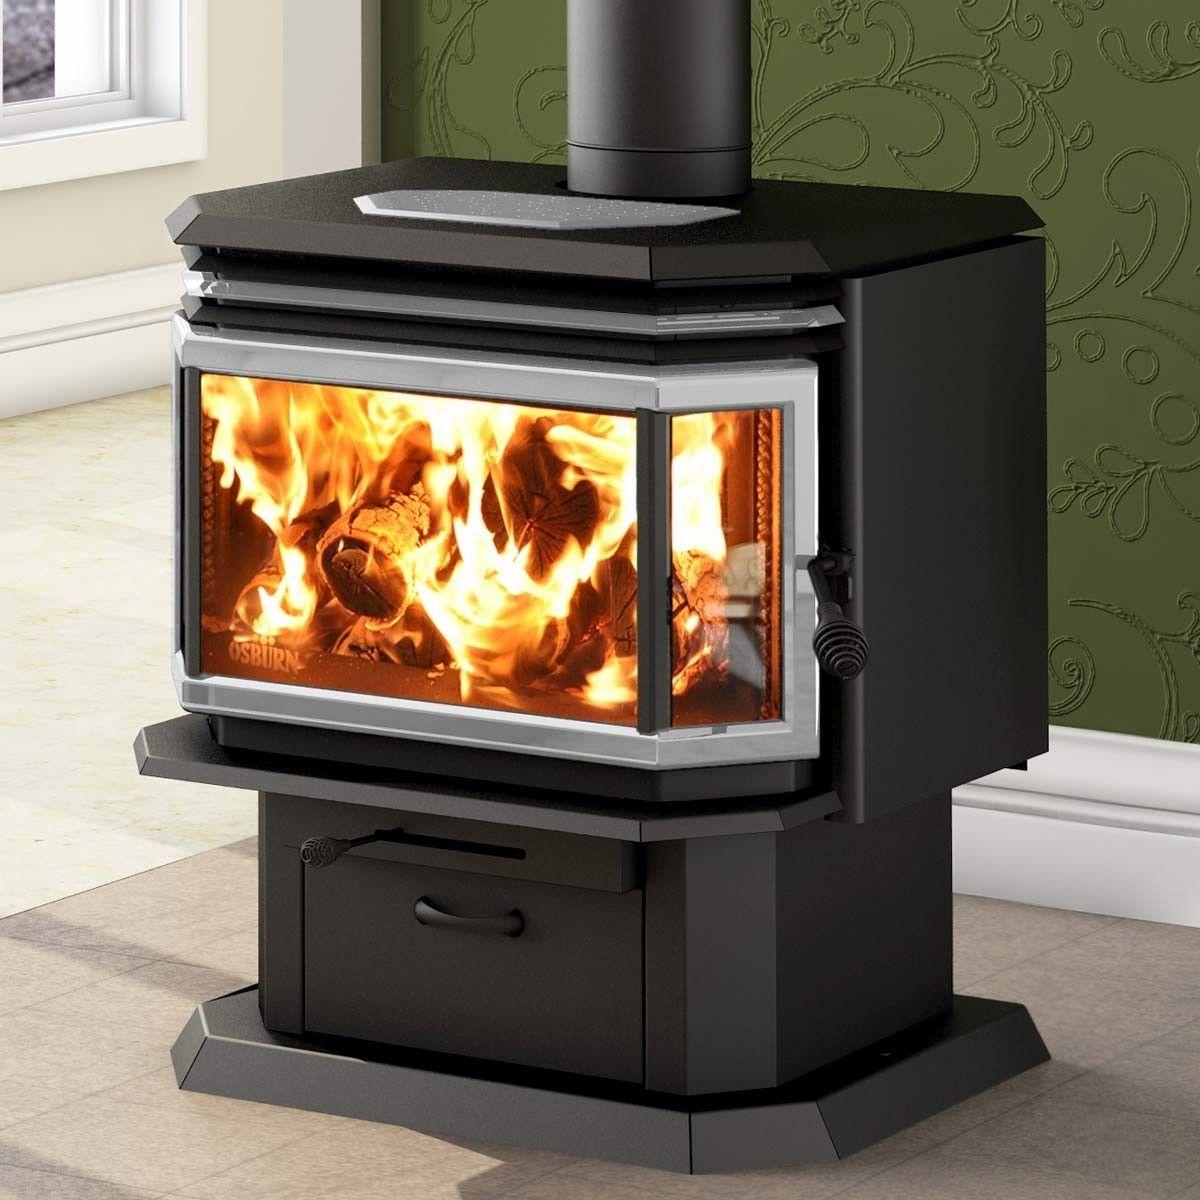 Stove Fireplace Unique Osburn 2200 Metallic Black Epa Wood Stove Ob In 2019